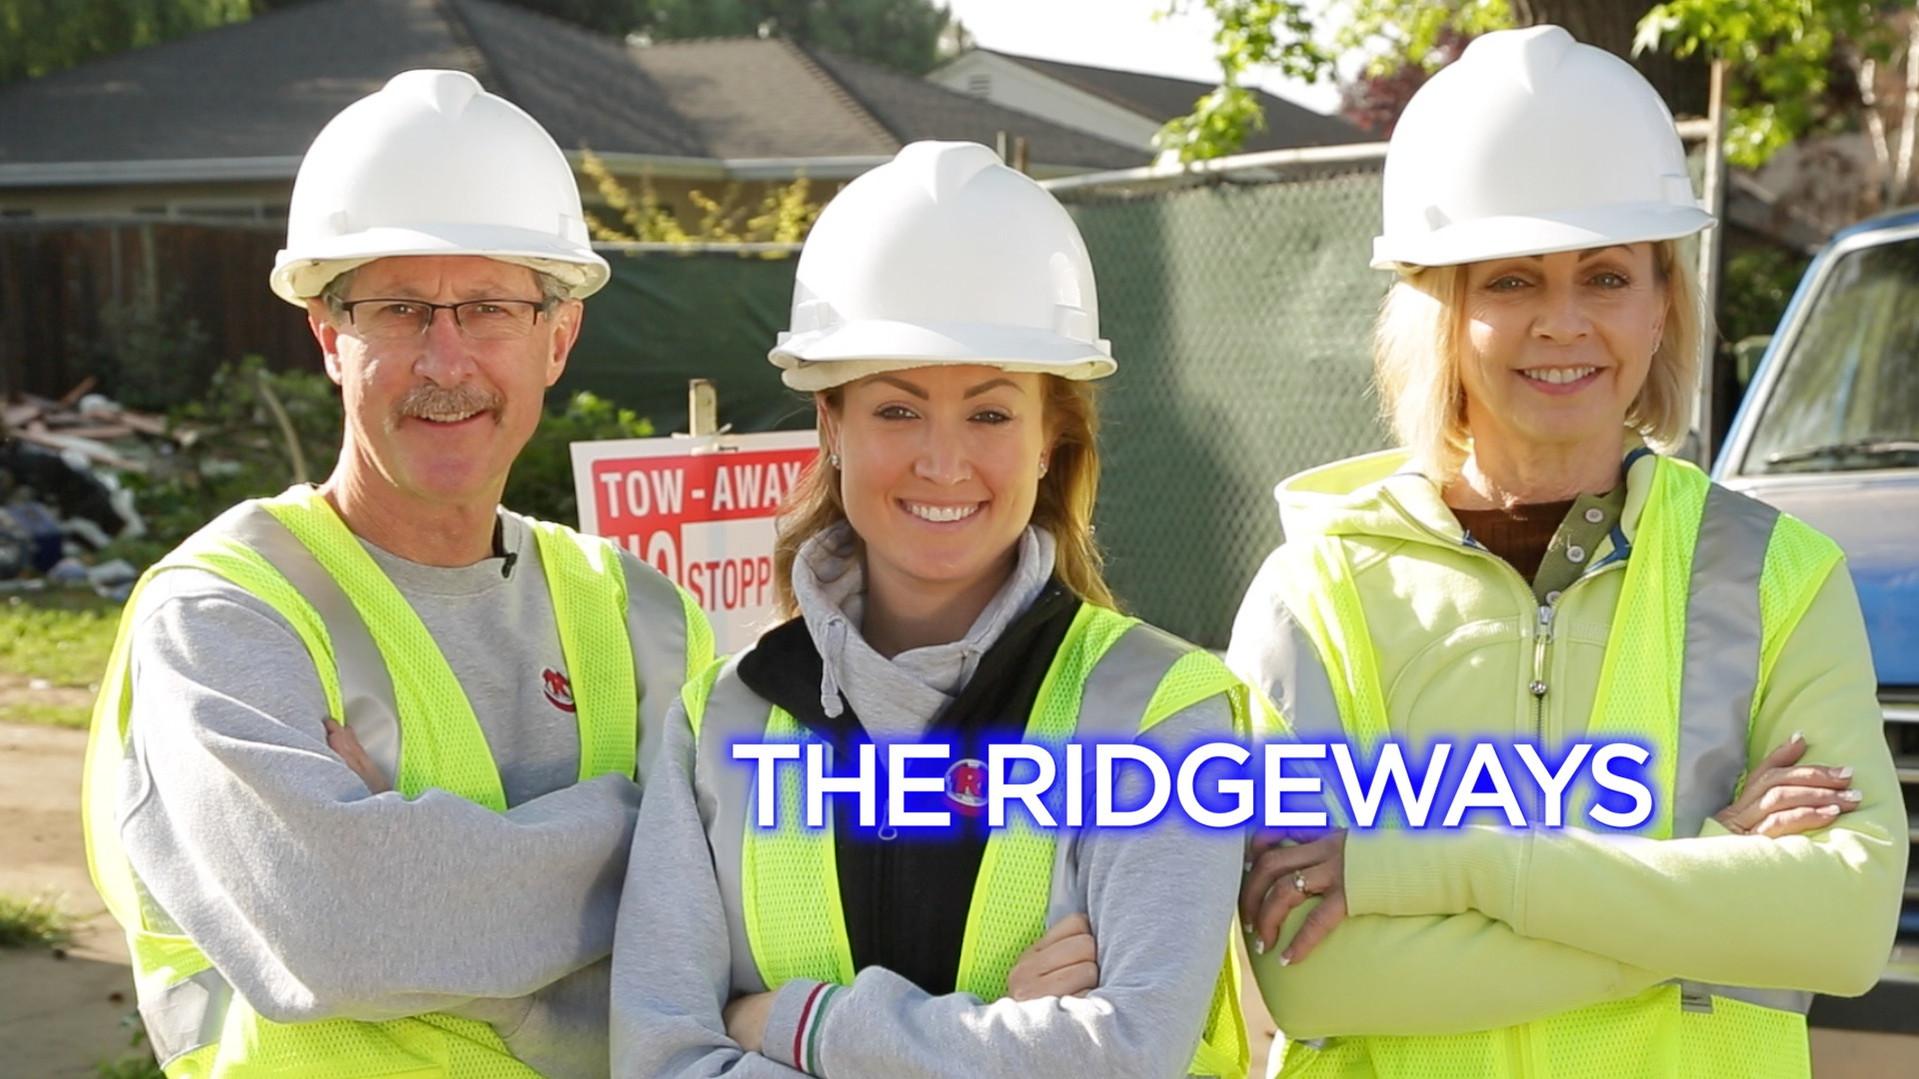 THE RIDGEWAYS